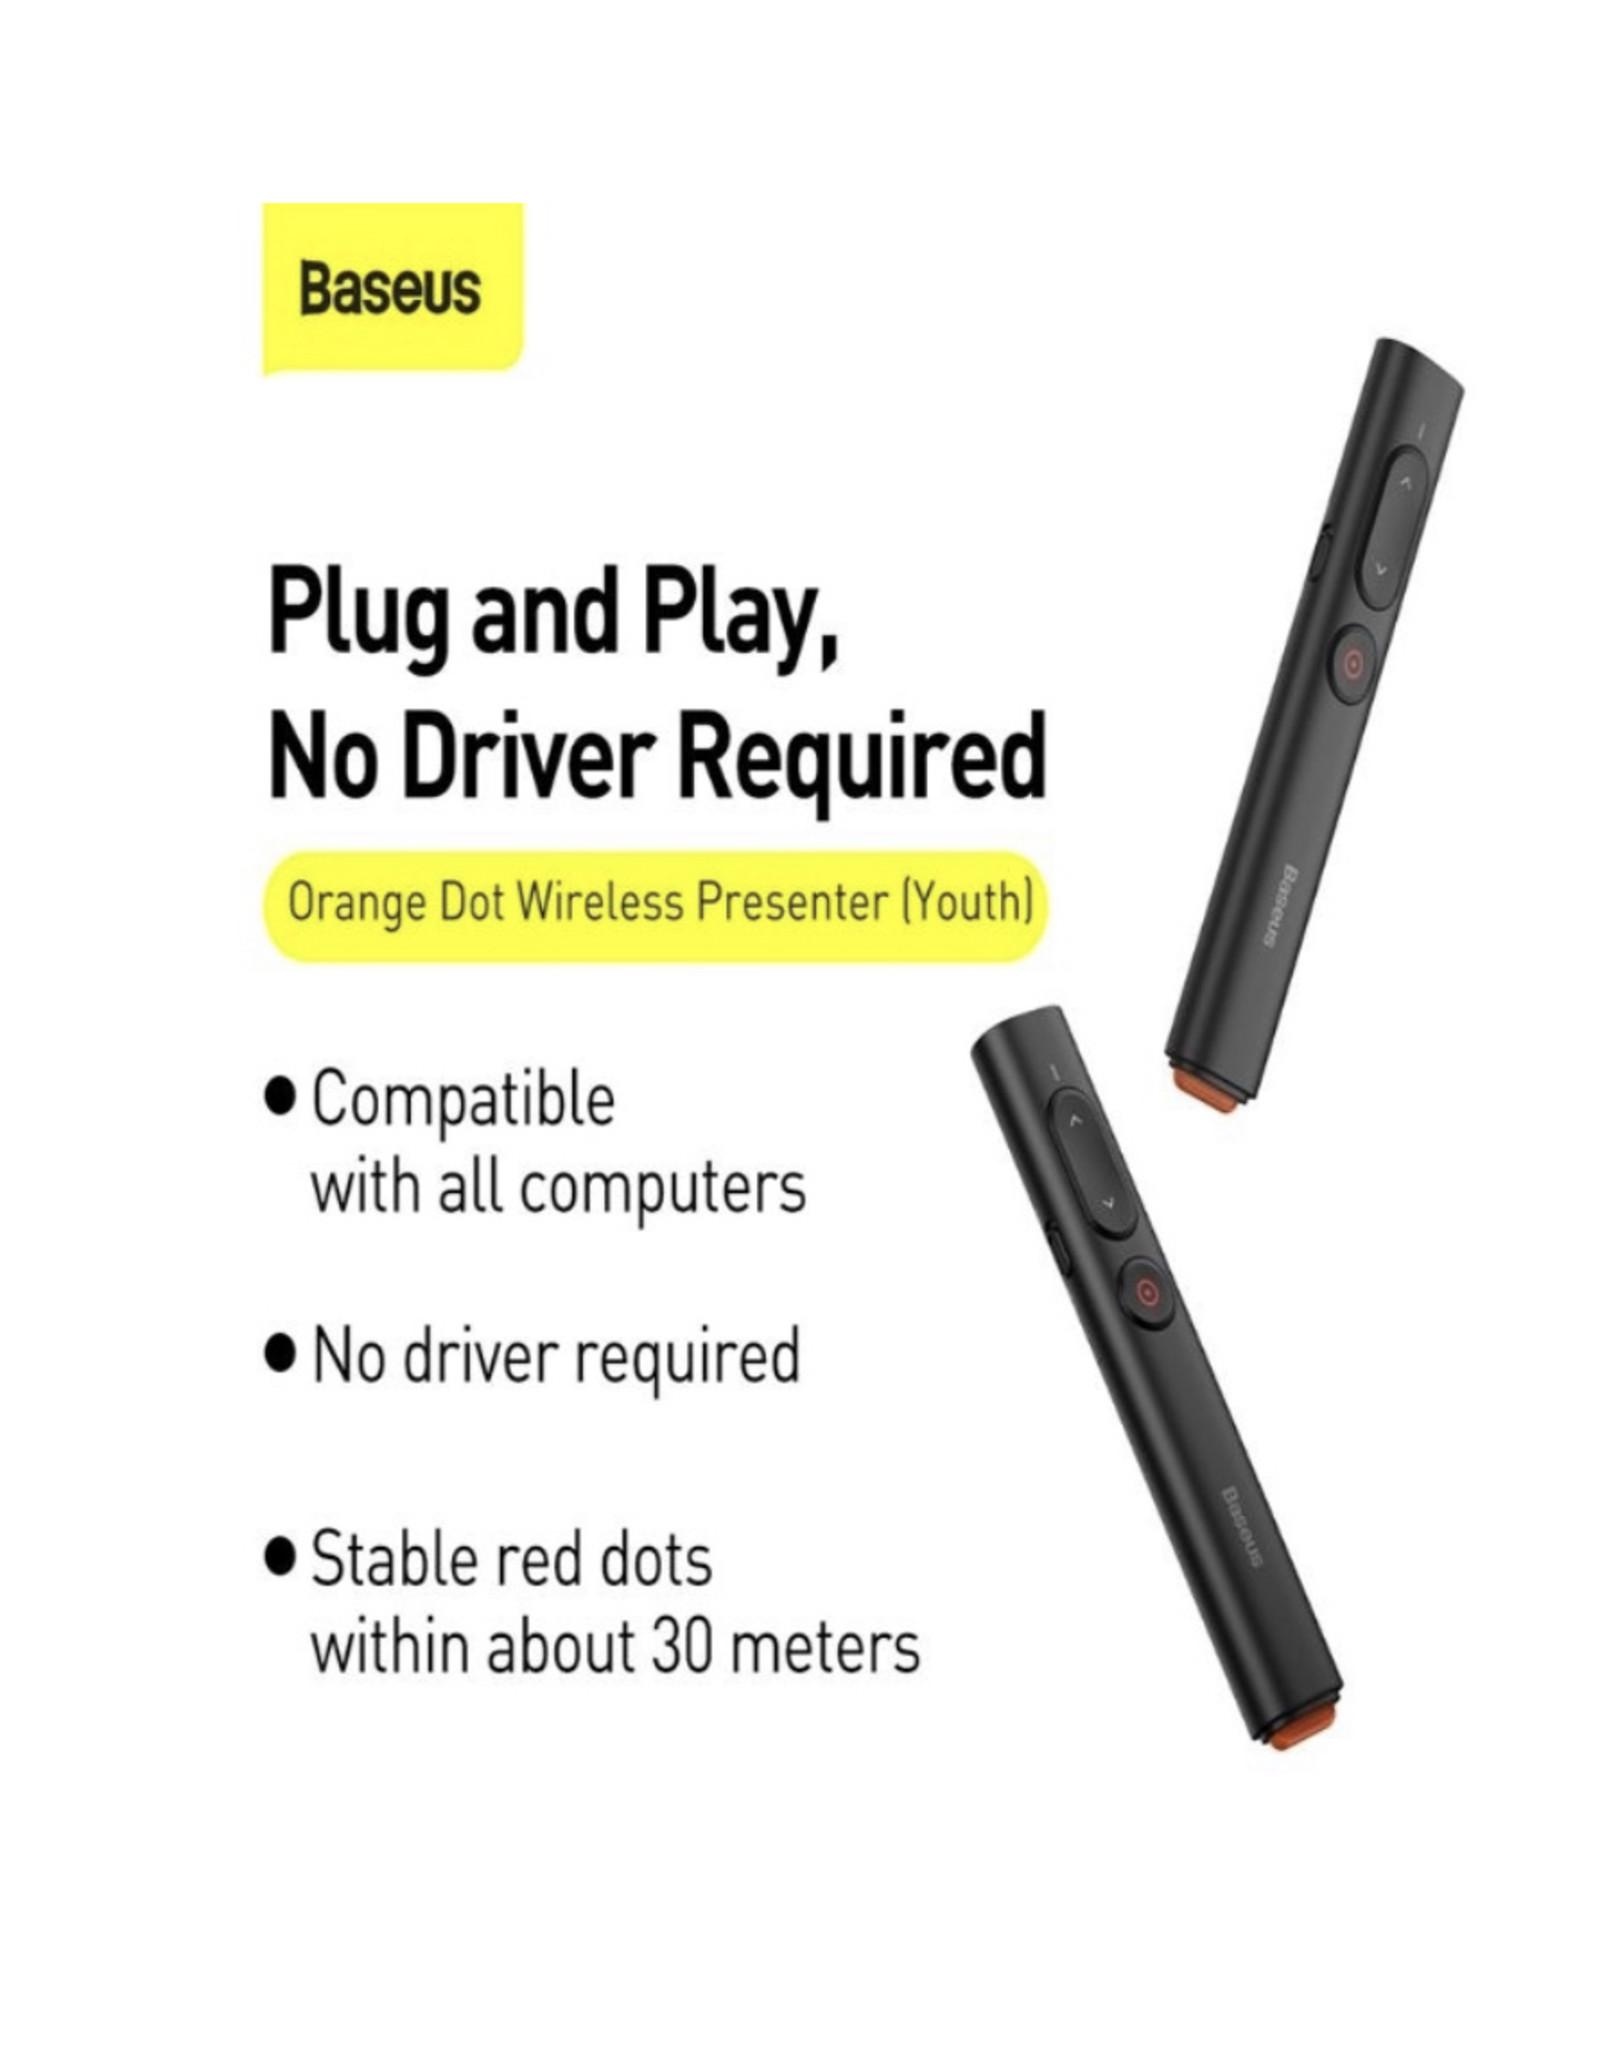 Baseus Baseus Orange Dot Wireless Presenter (Red Laser) Grey Baseus Cloud 6